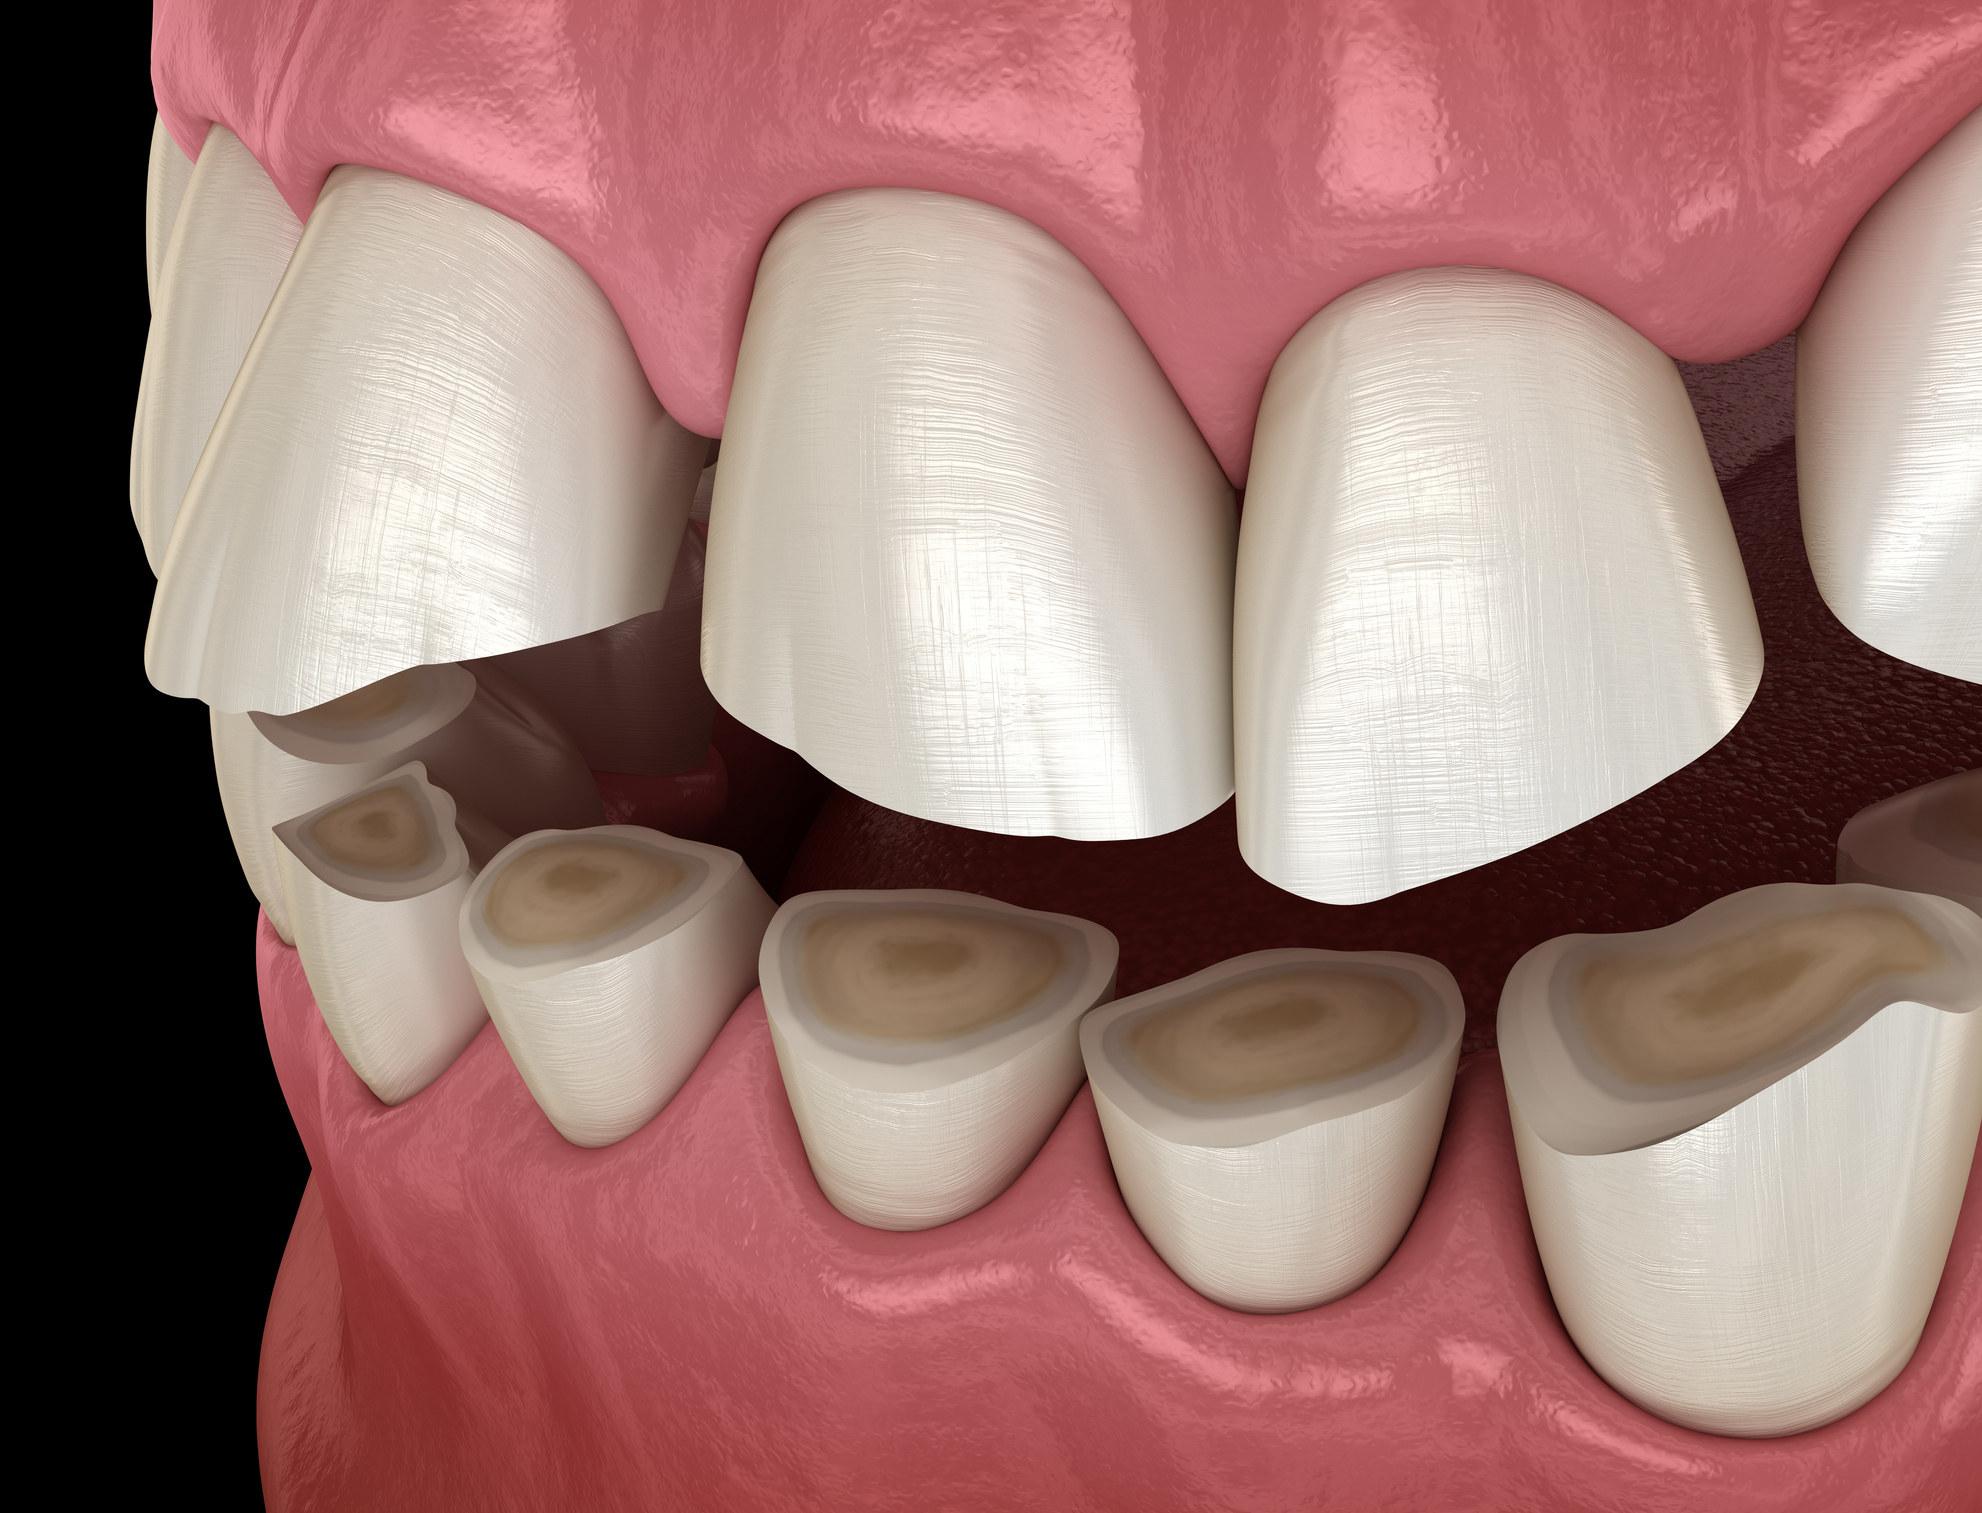 Ground down teeth